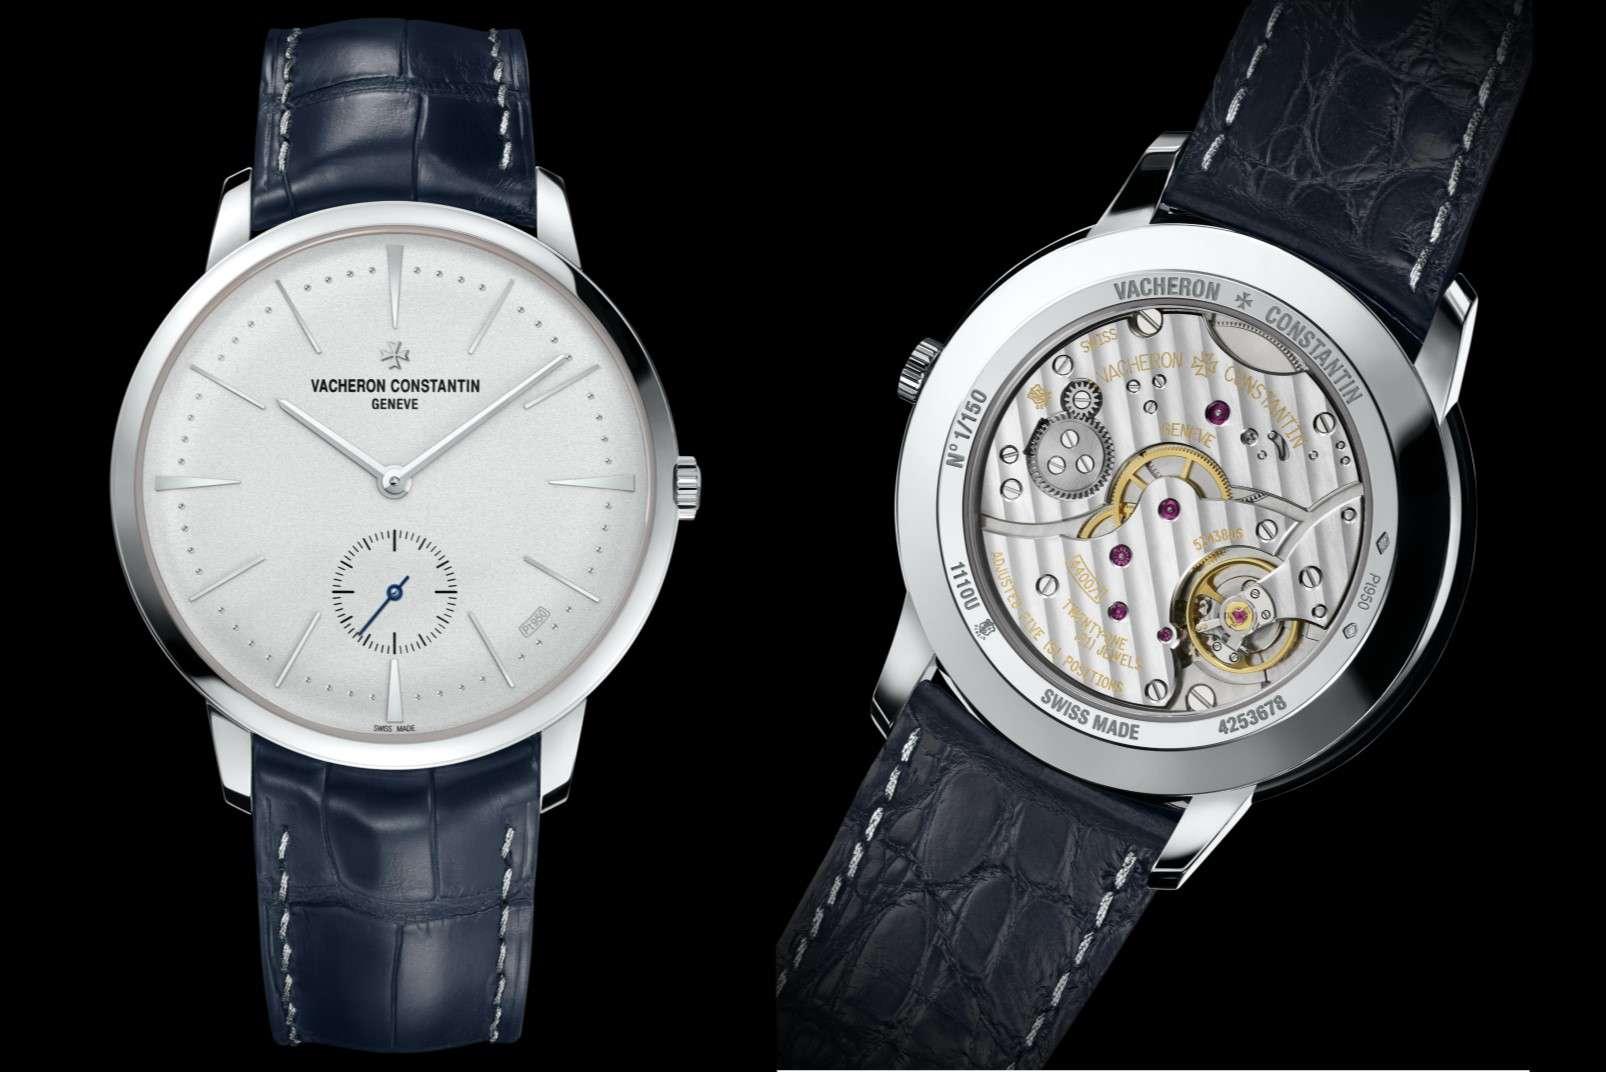 Vacheron Constantin Patrimony 42 CEP 1110U-000P-B306 dress watch